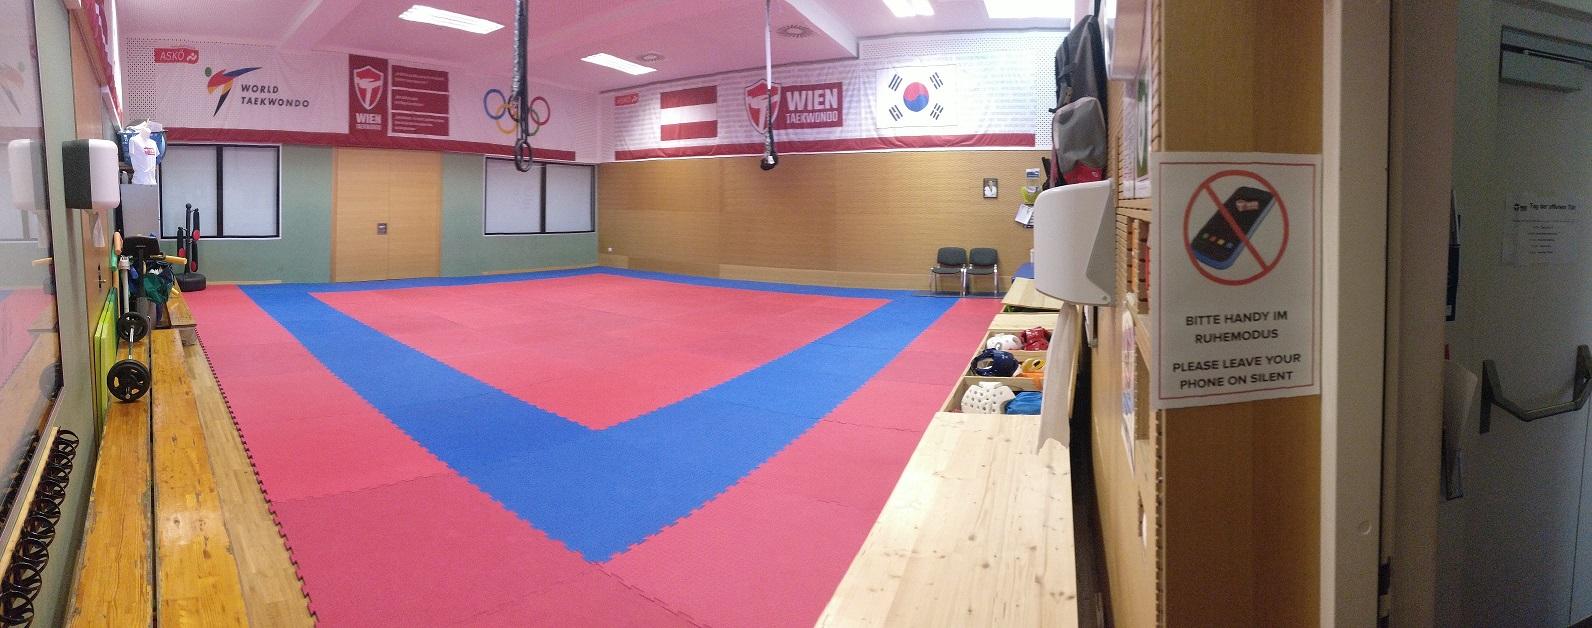 taekwondo raum stundenplan